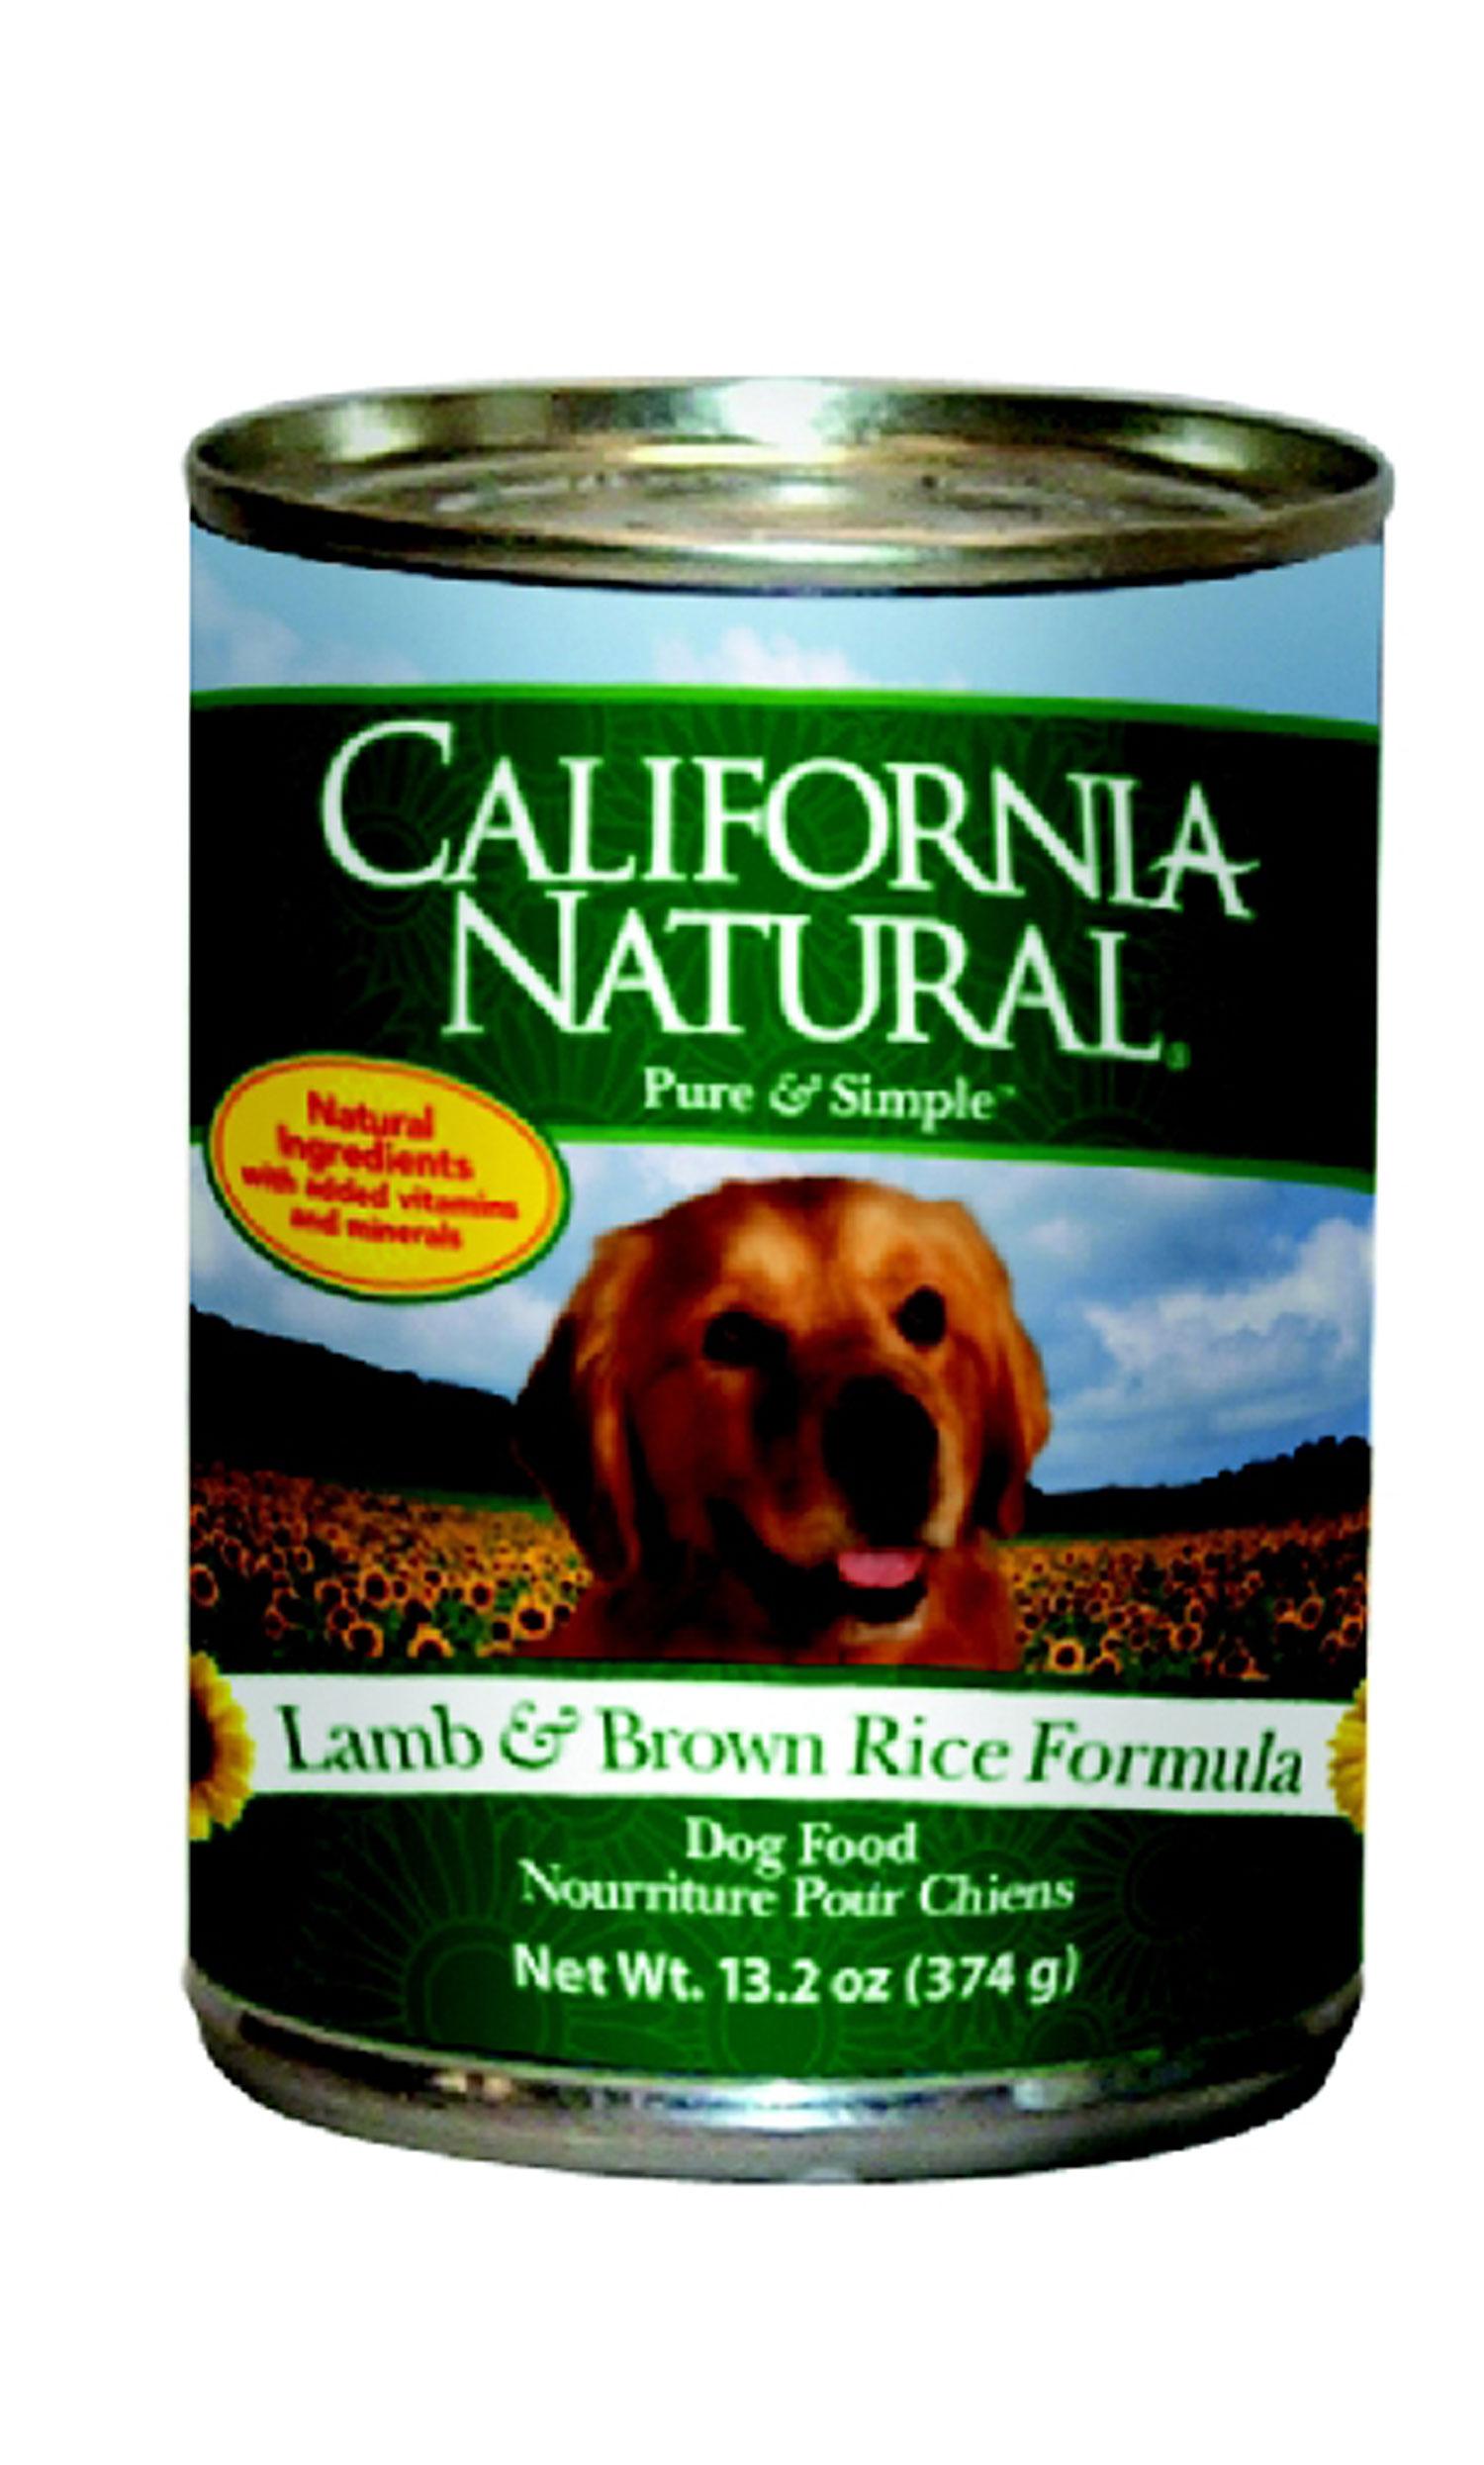 California Natural Canned Dog Food Reviews